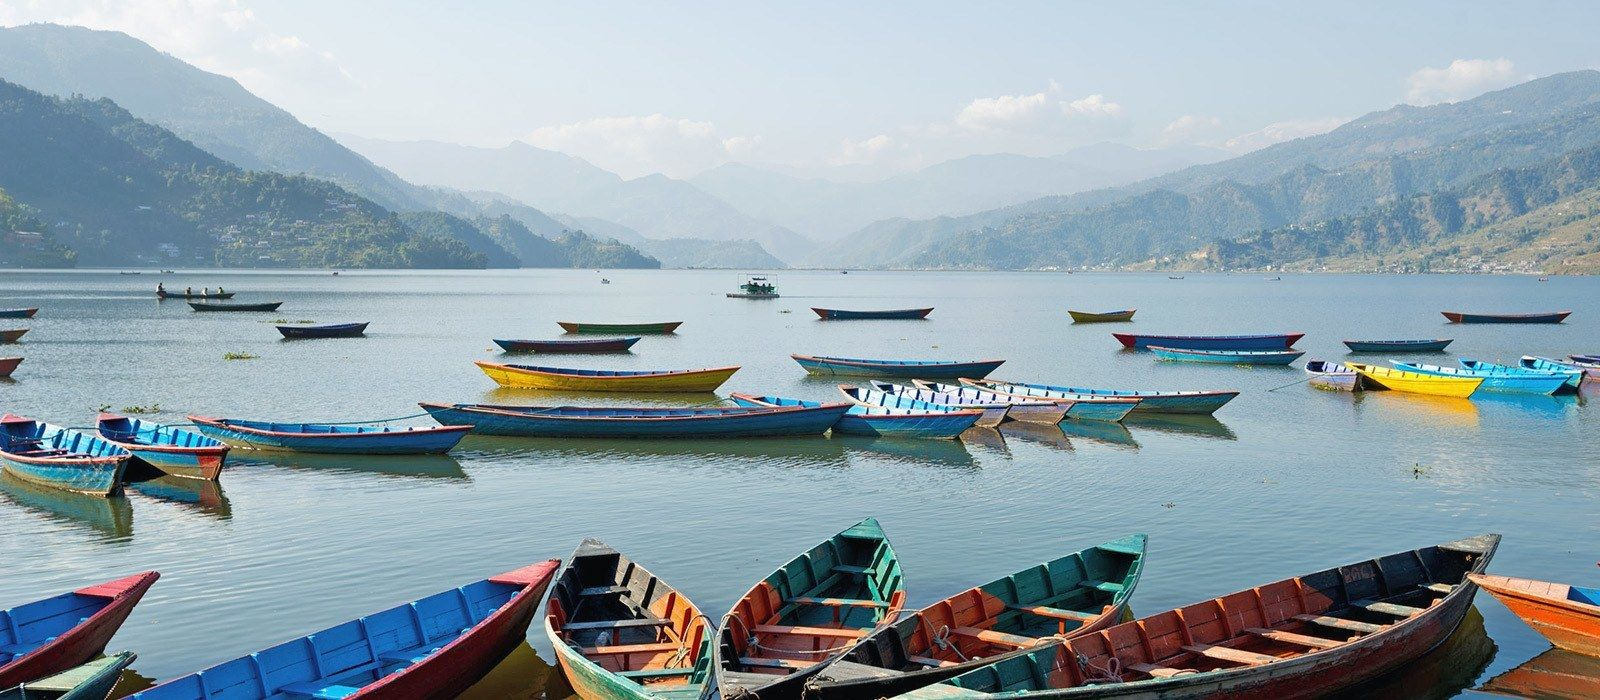 Nepalreise: Paläste, Tiger und Himalaya Urlaub 1